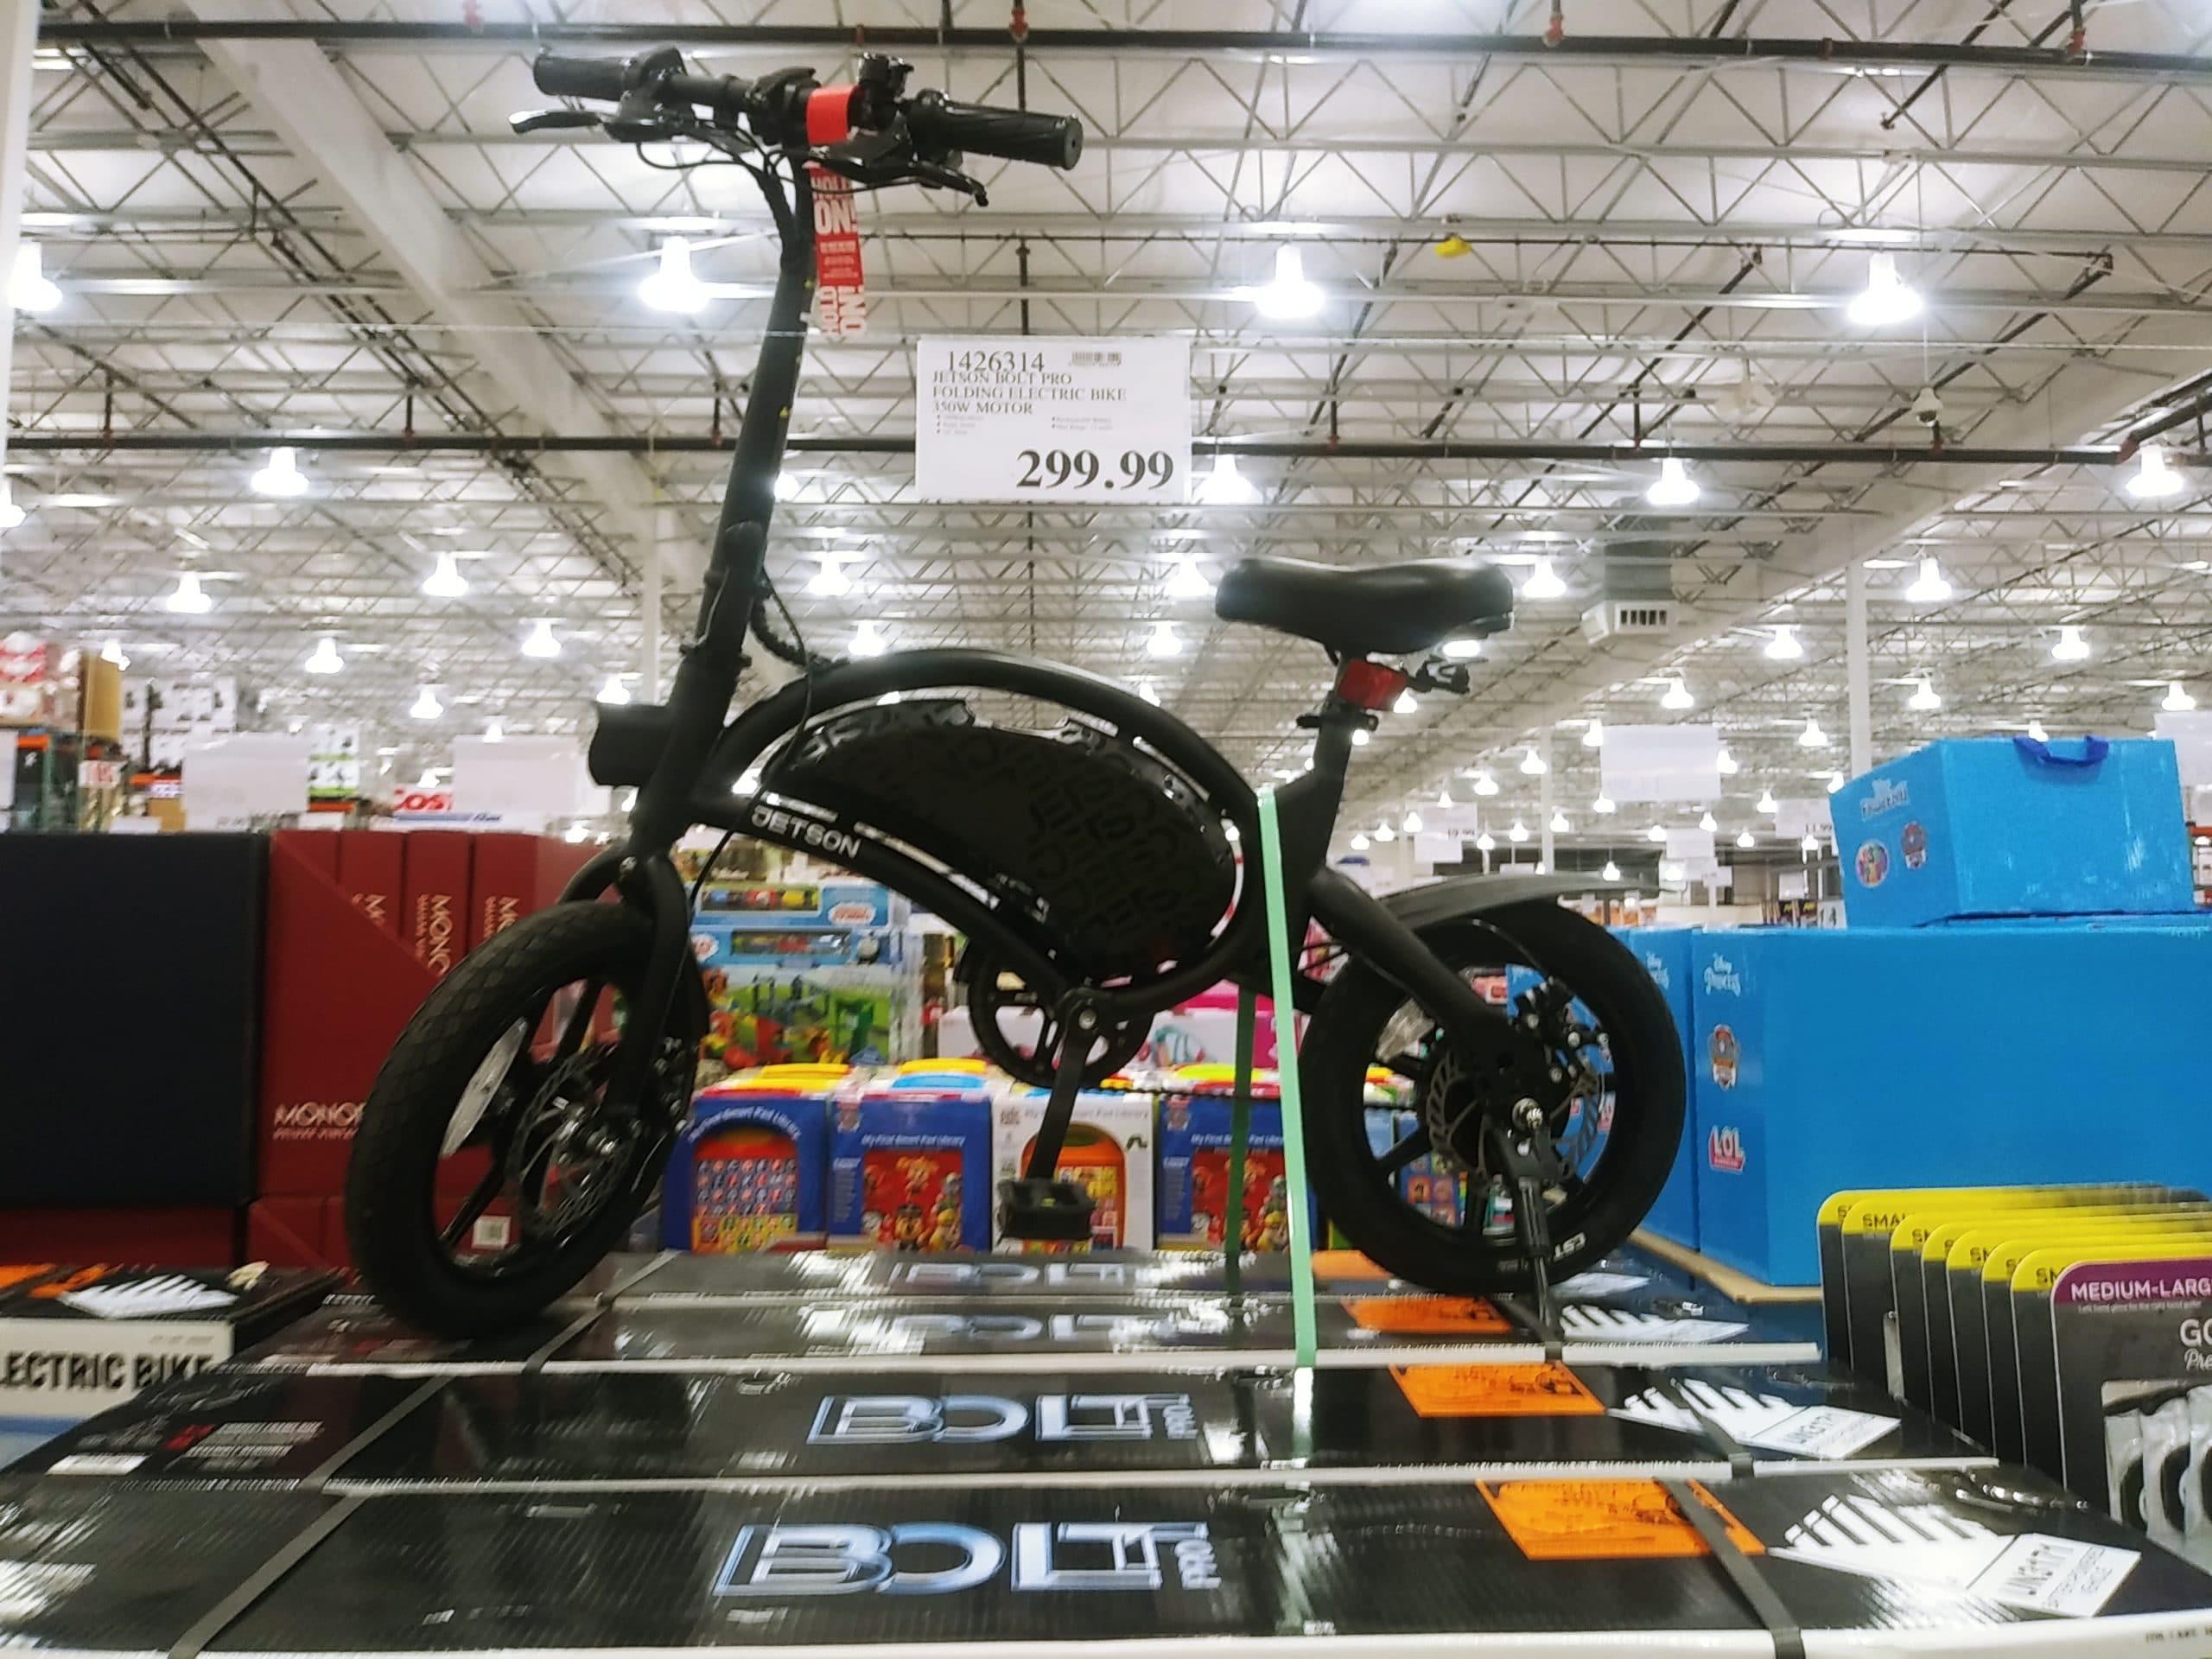 Jetson Bolt Pro Folding E Bike $299.99